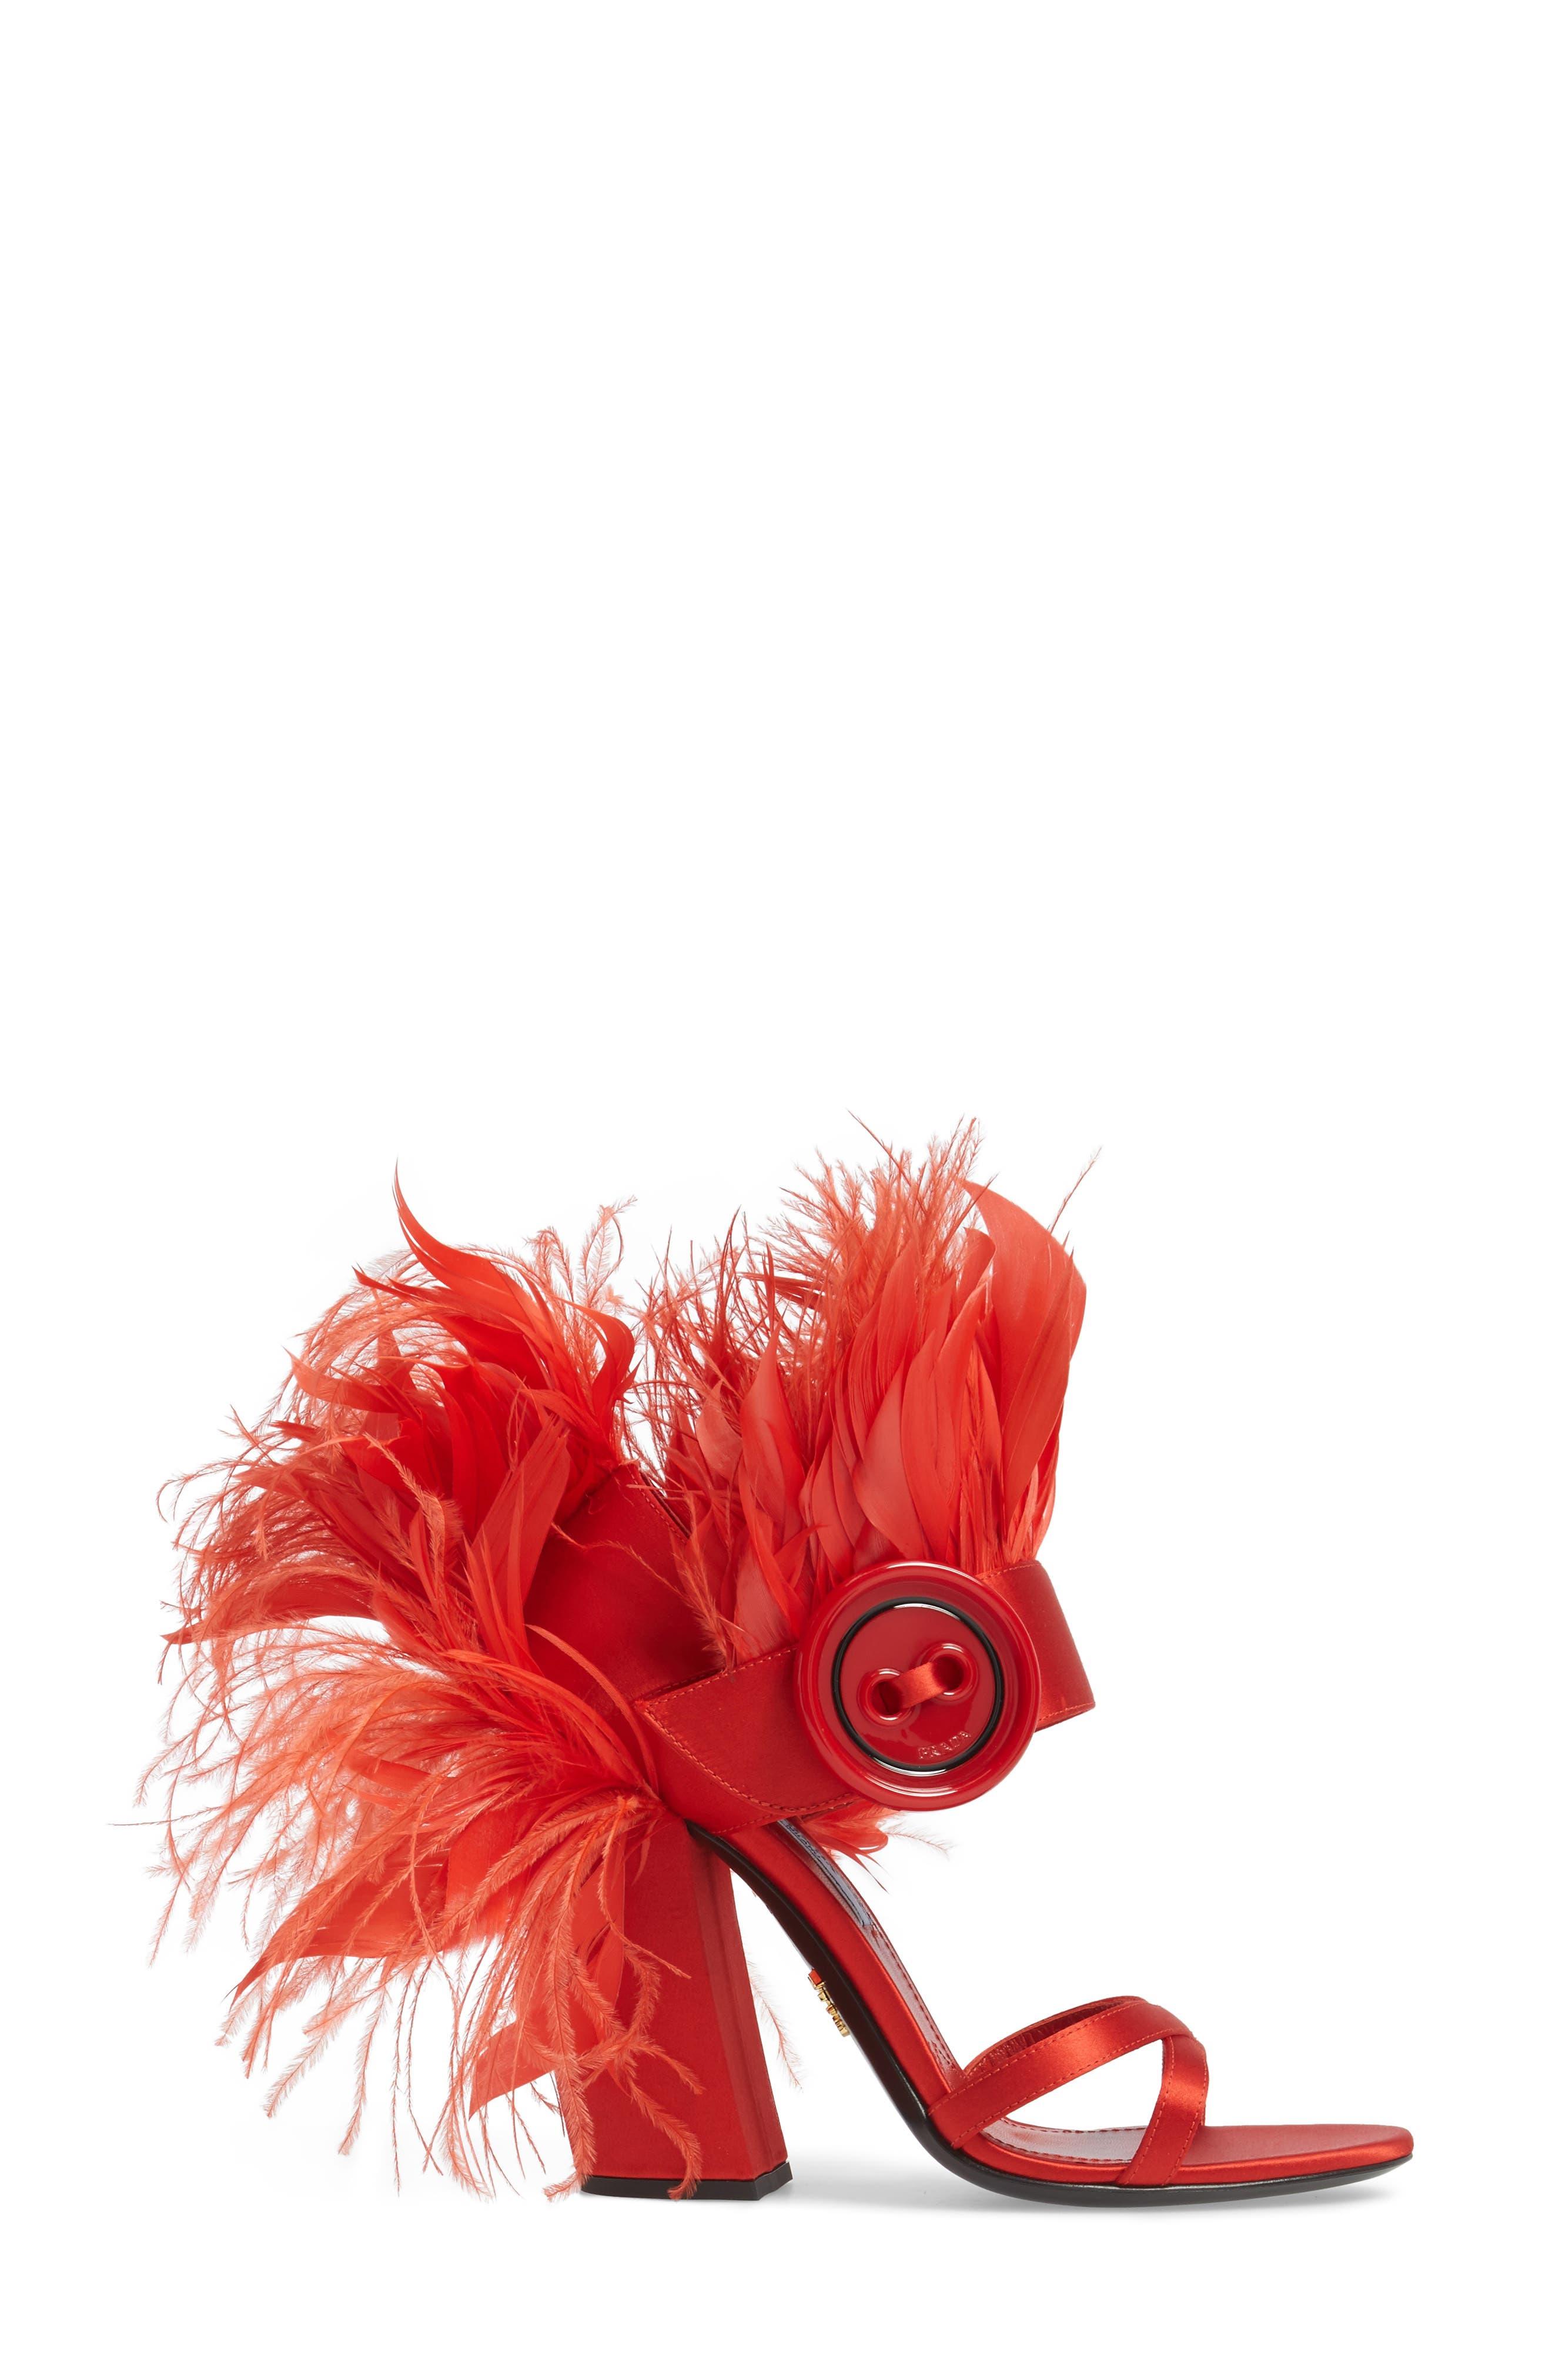 Feather Block Heel Sandal,                             Alternate thumbnail 3, color,                             Red Satin